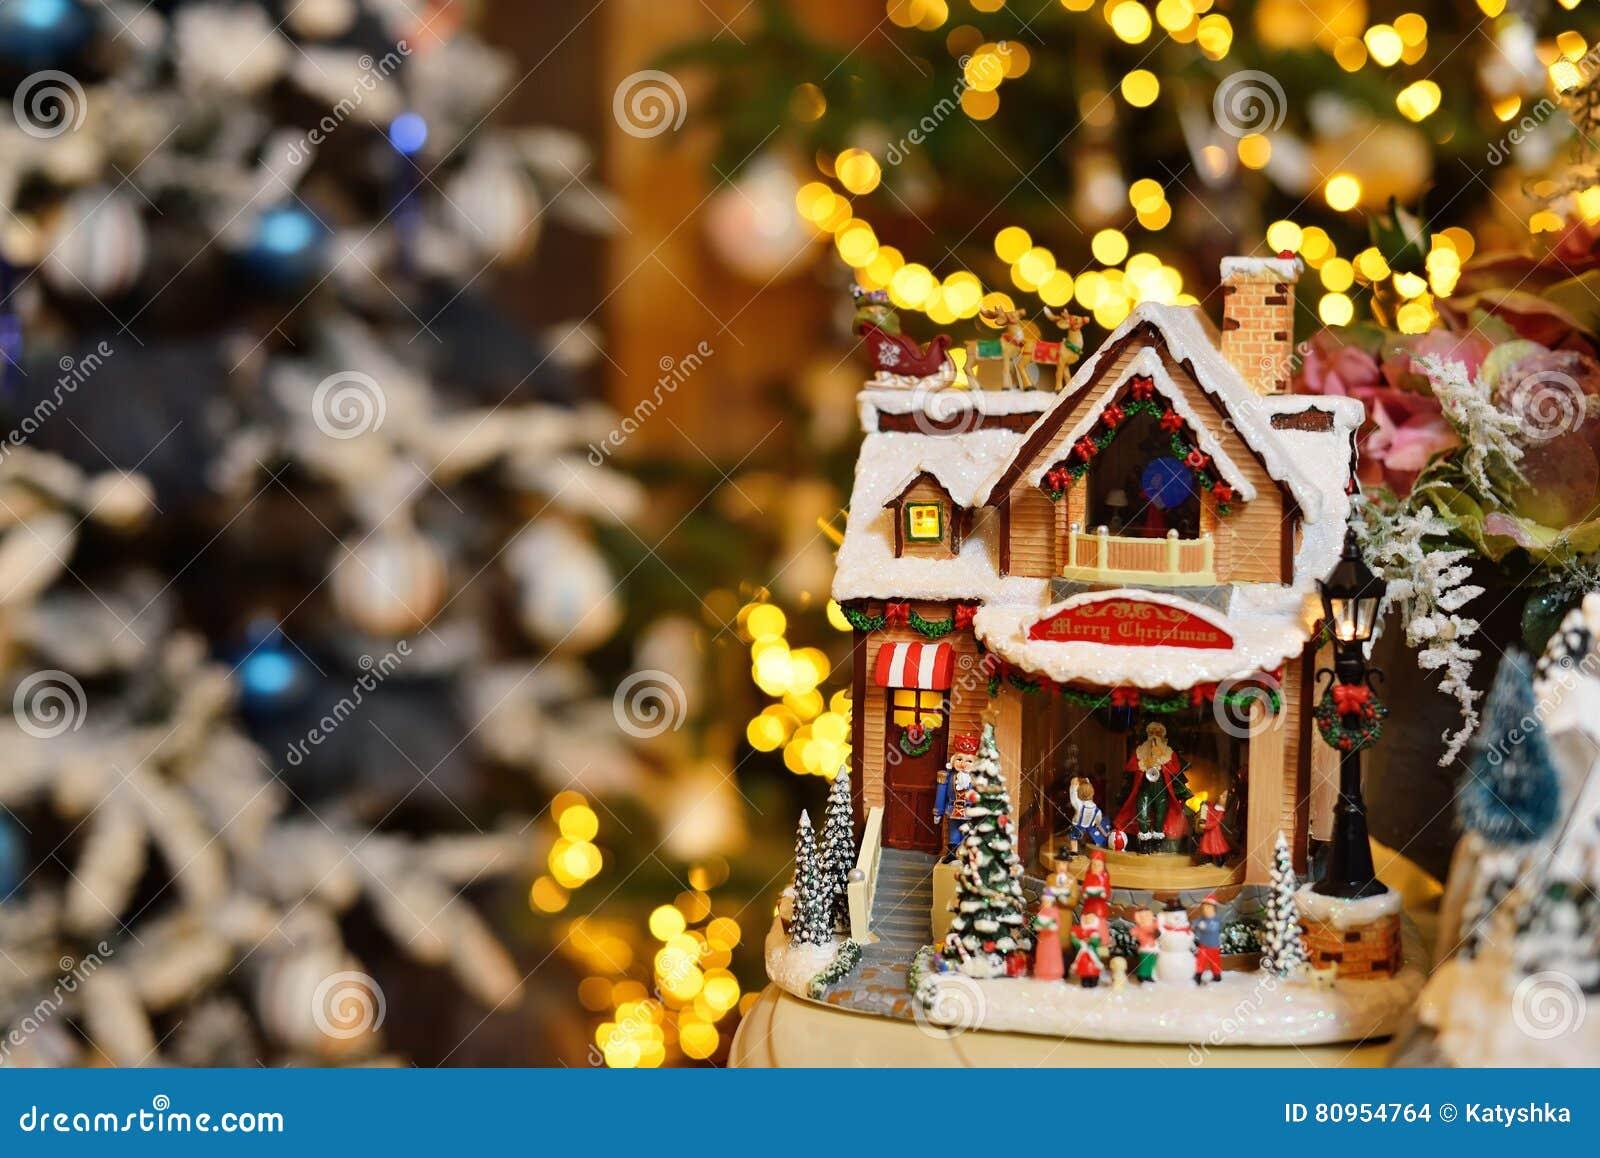 Adorable christmas music toy house with miniature santa for Christmas house music